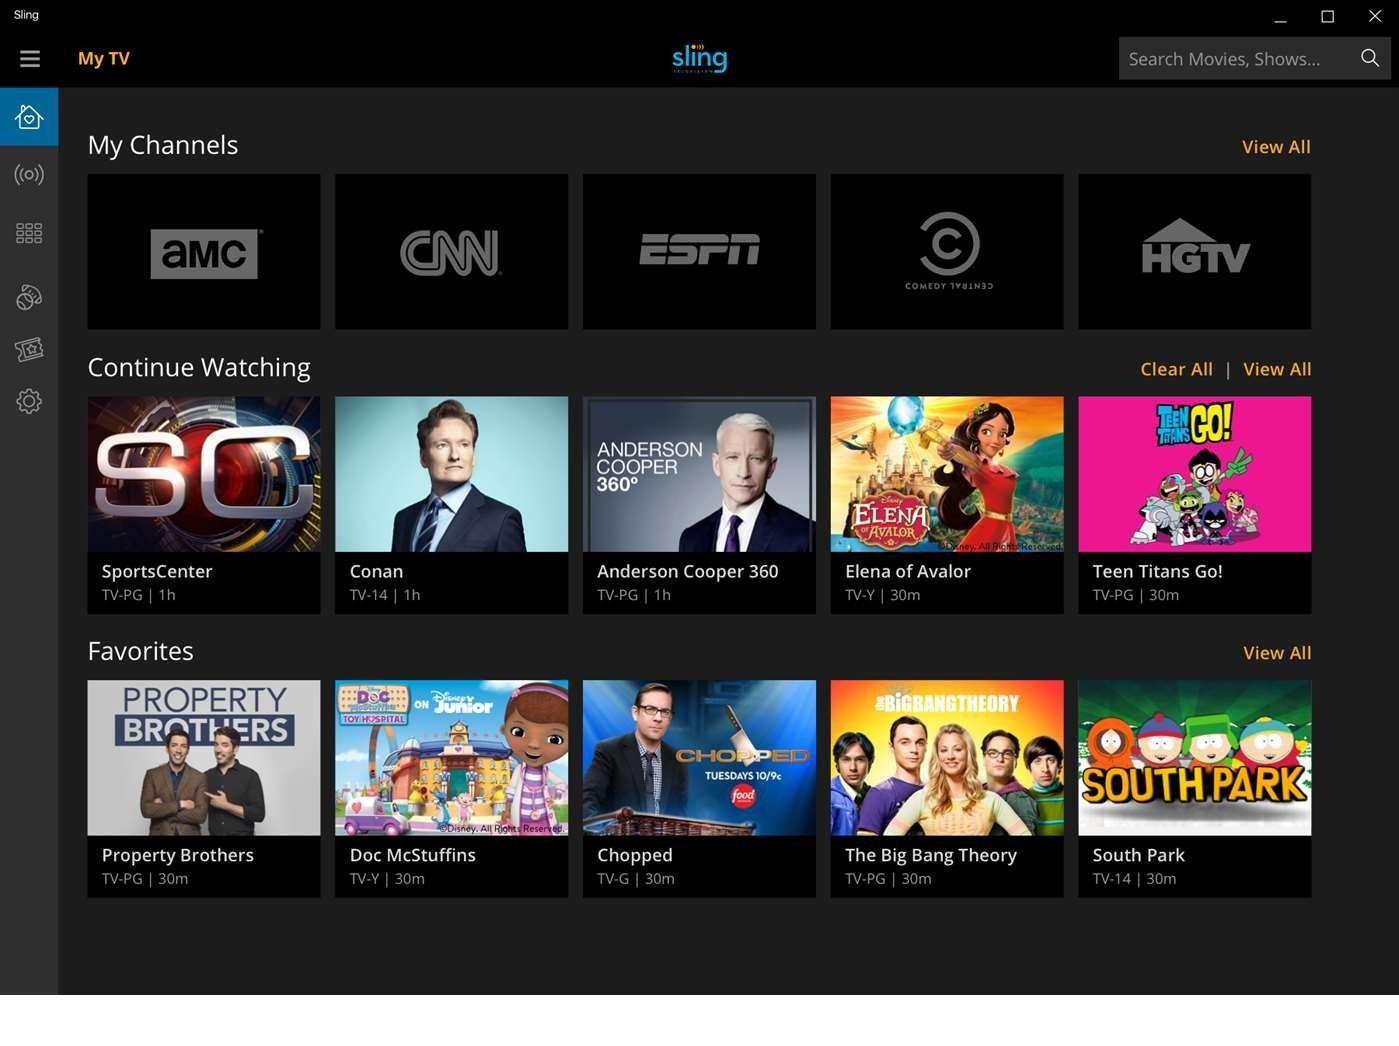 Sling TV Makes its Debut on Windows 10 Avalor